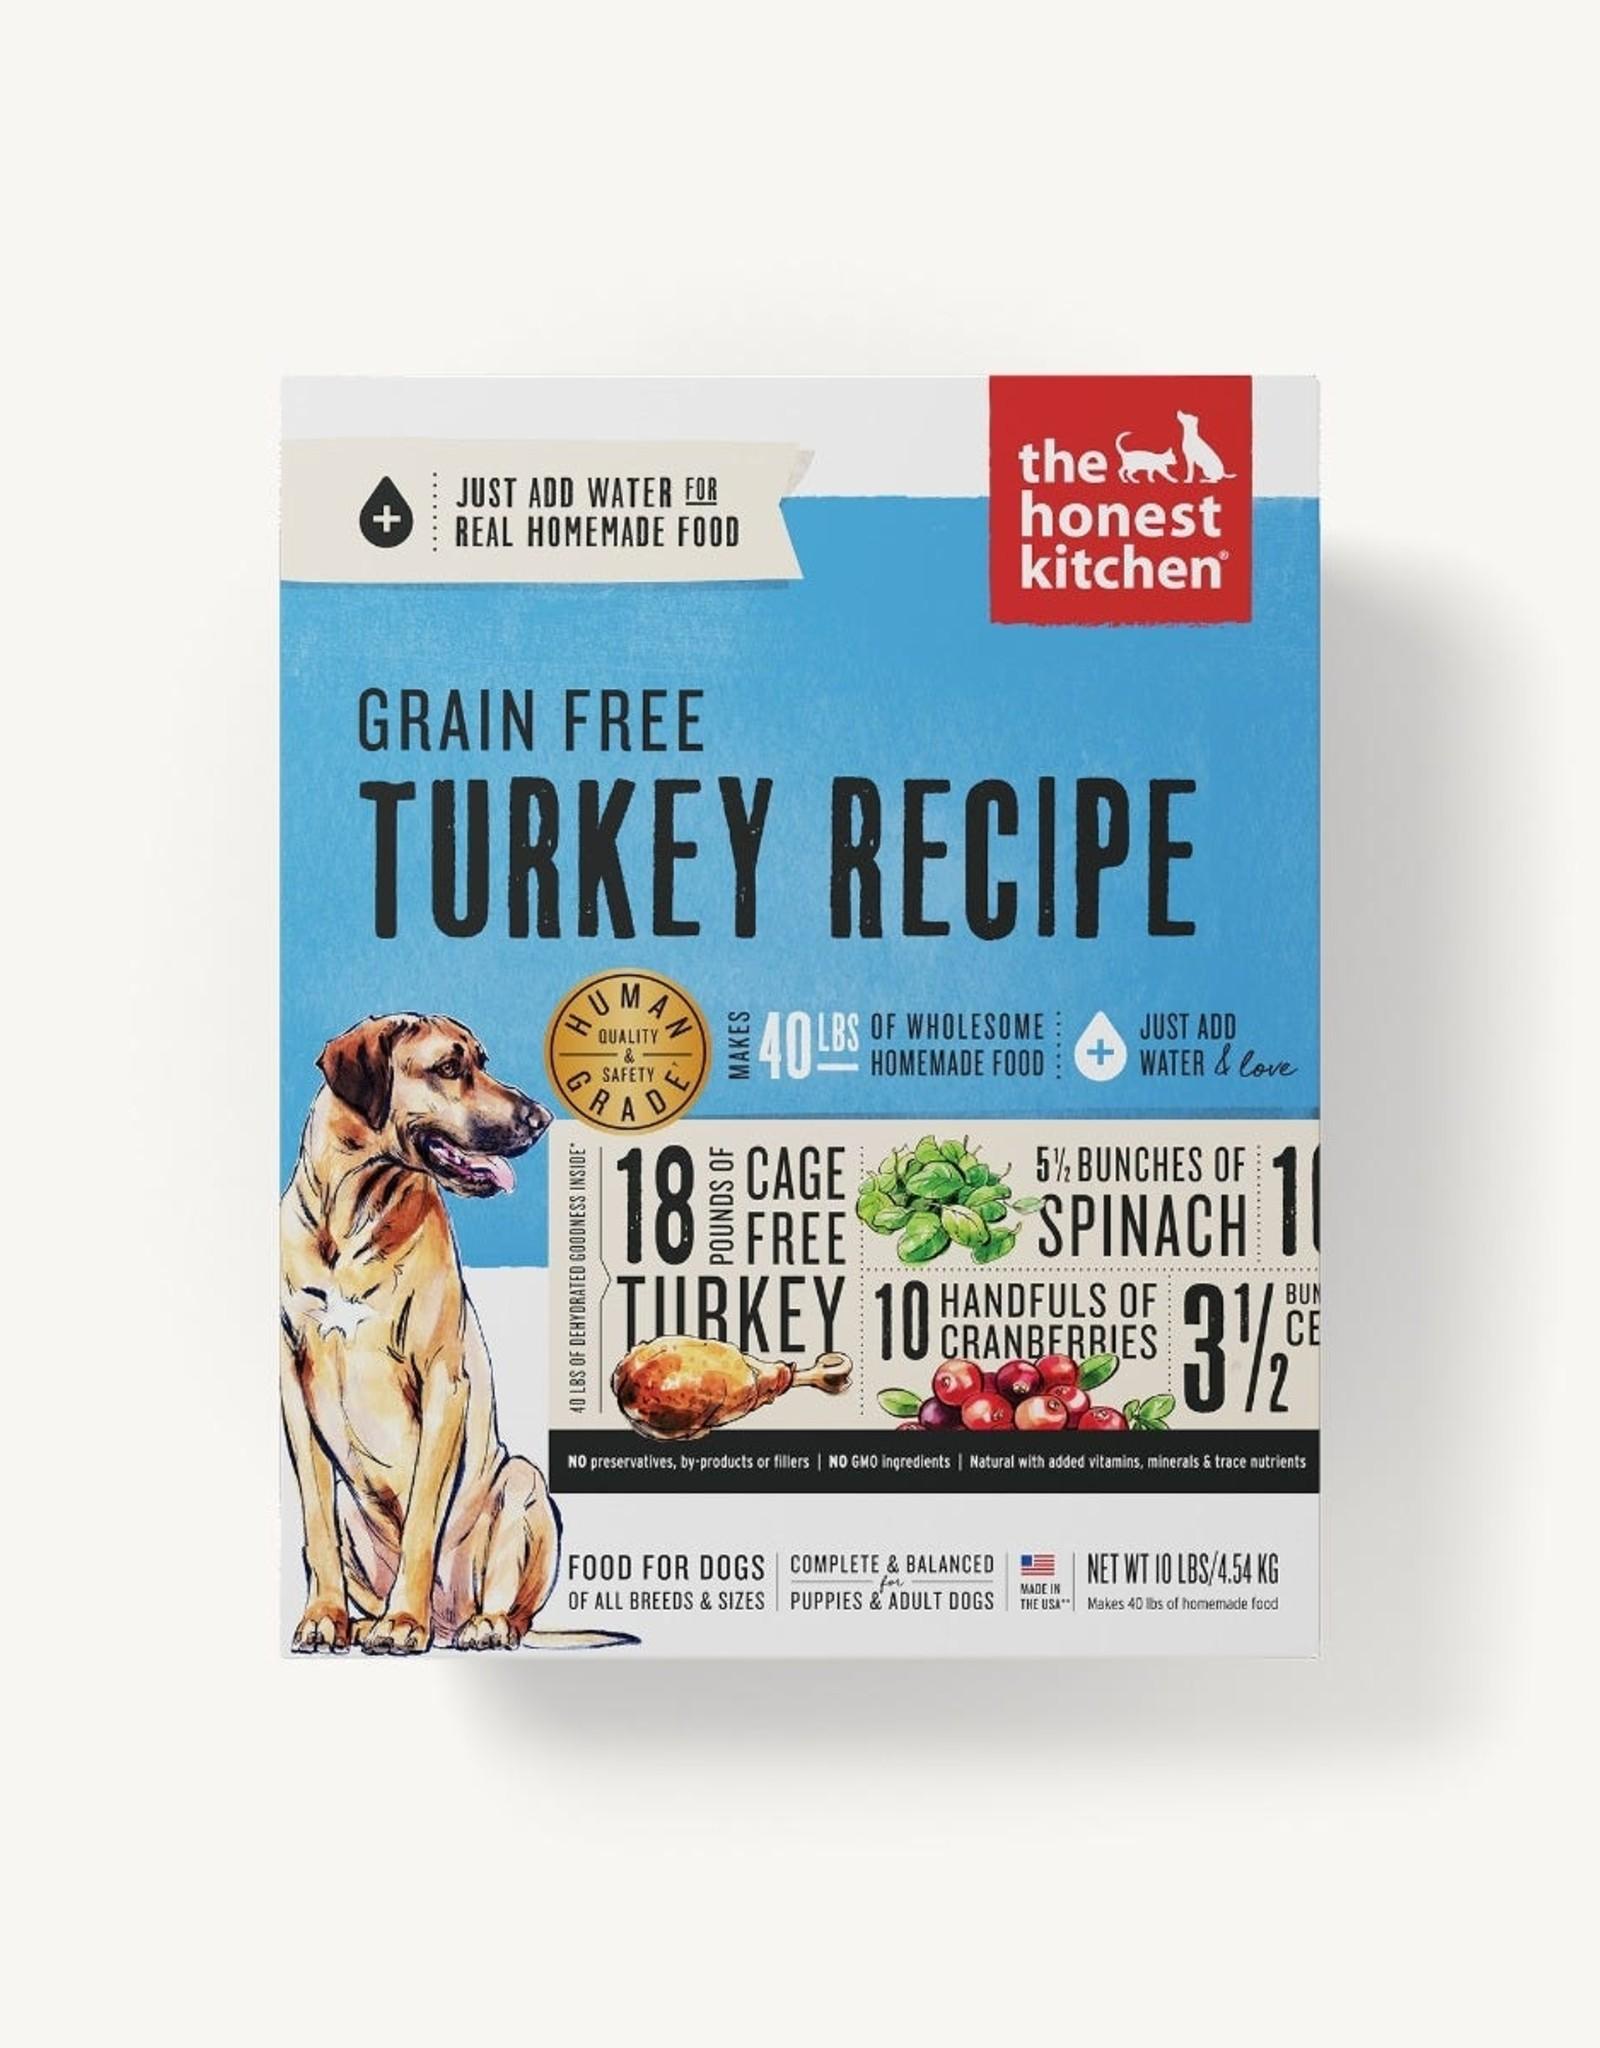 THE HONEST KITCHEN The Honest Kitchen | Grain-Free Turkey Recipe Dehydrated Dog Food (Embark) 10 lb box